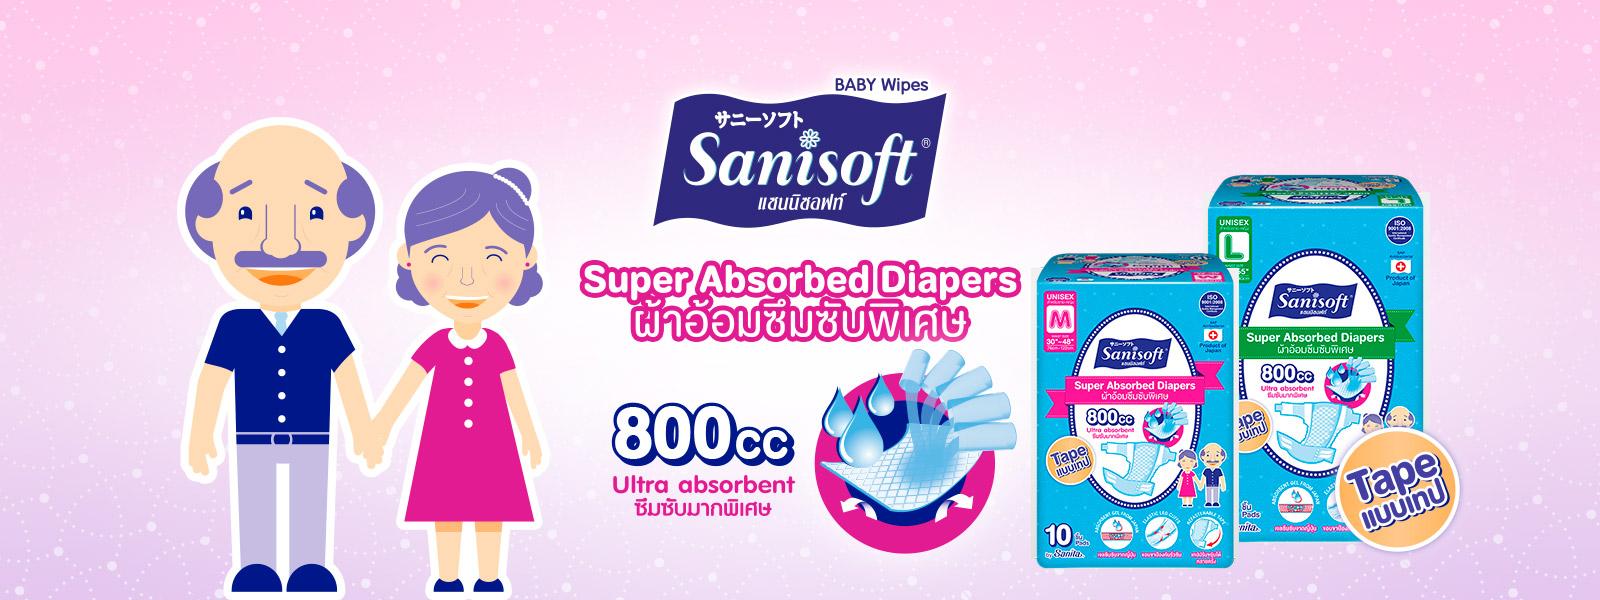 sanisoft แซนนิซอฟท์ absorbed diapers tape ผ้าอ้อมผู้ใหญ่ แบบเทป